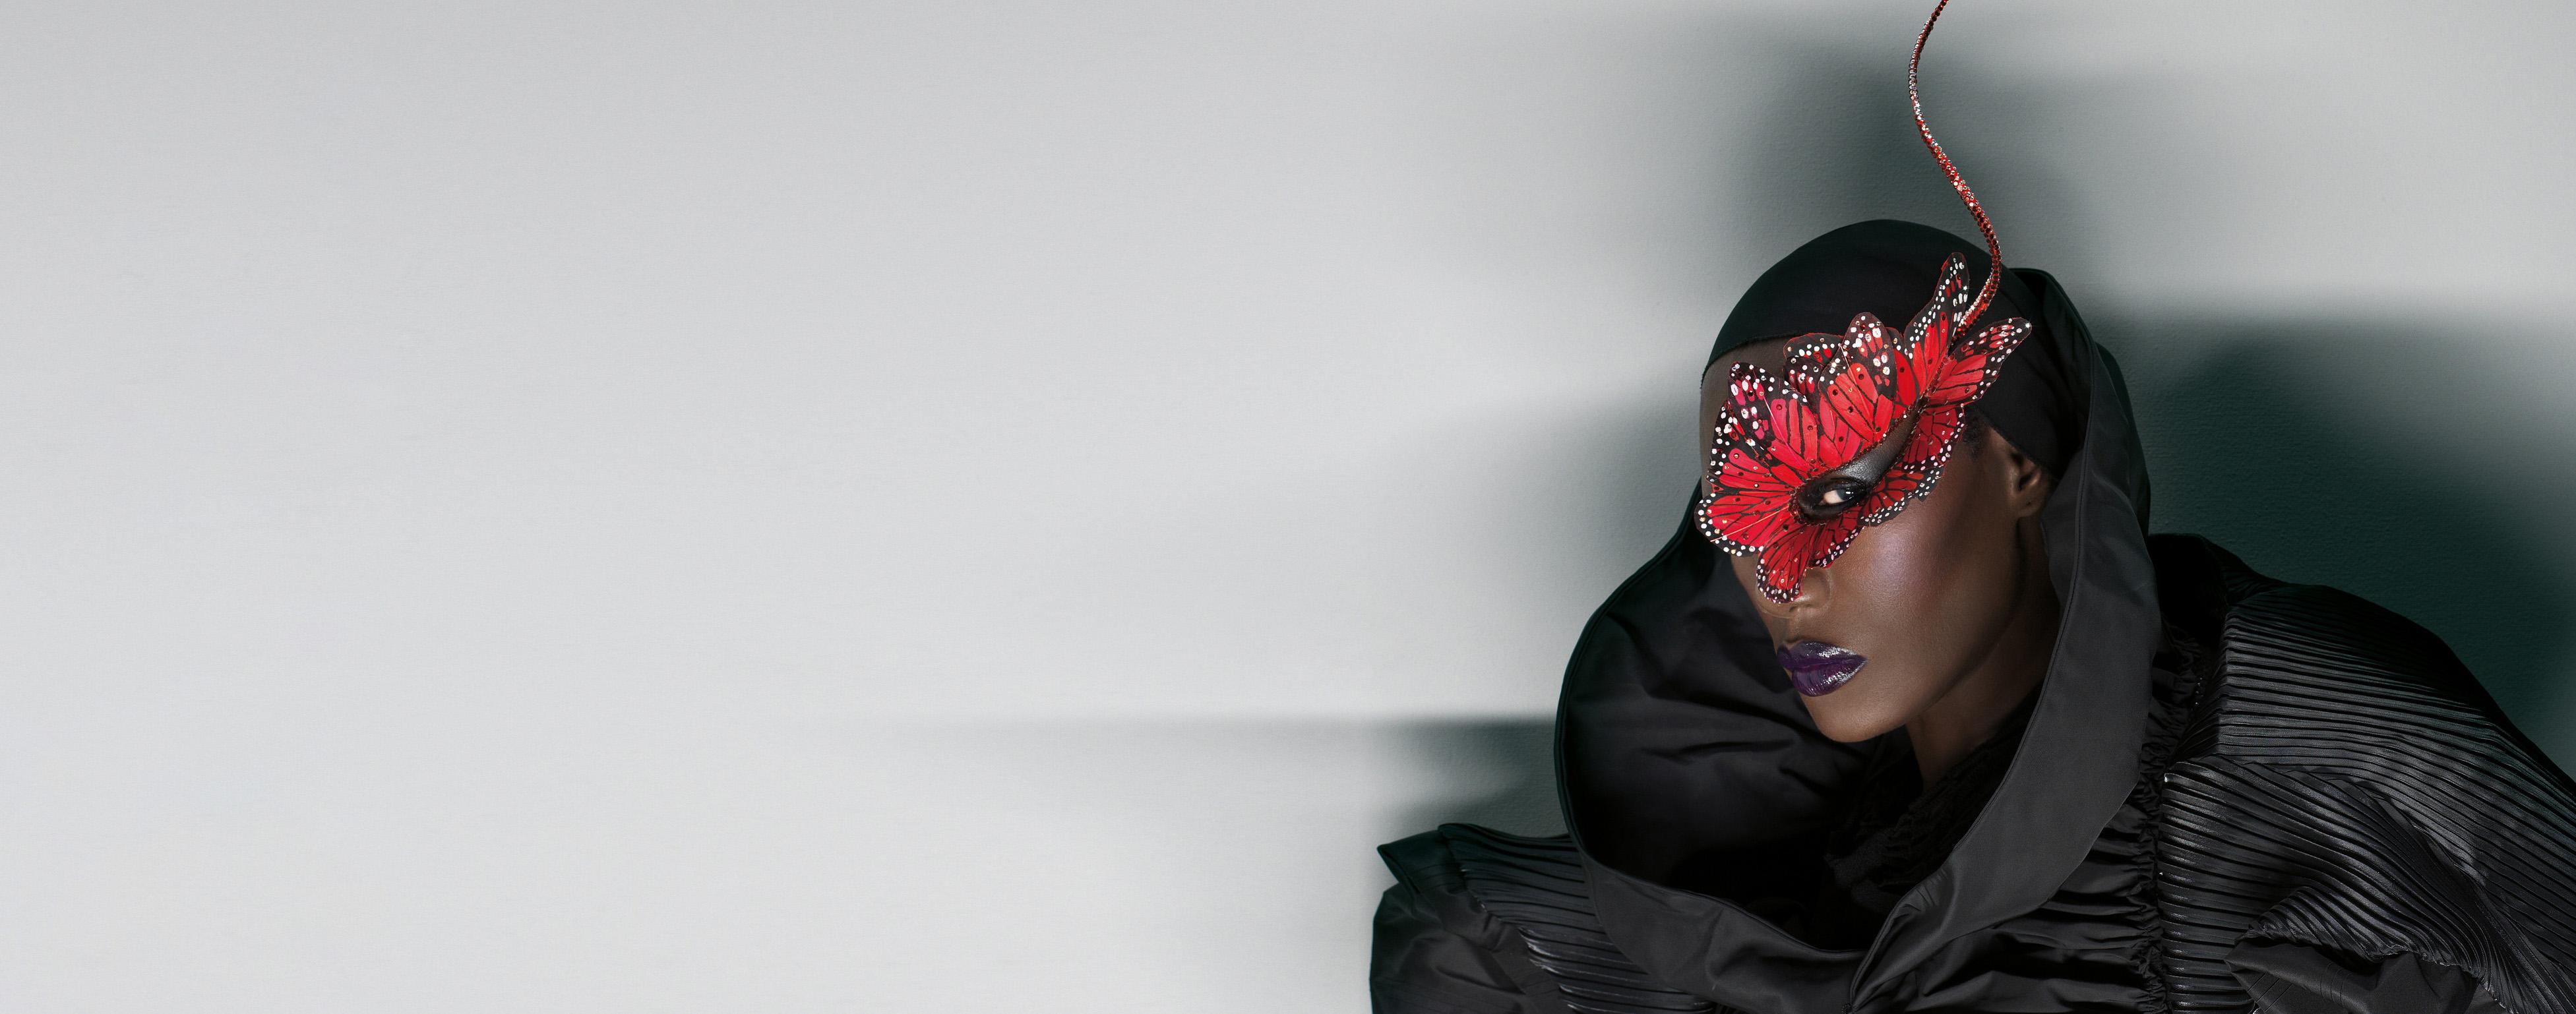 Southbank Centre announces Grace Jones as curator of Meltdown 2020 - FAD Magazine